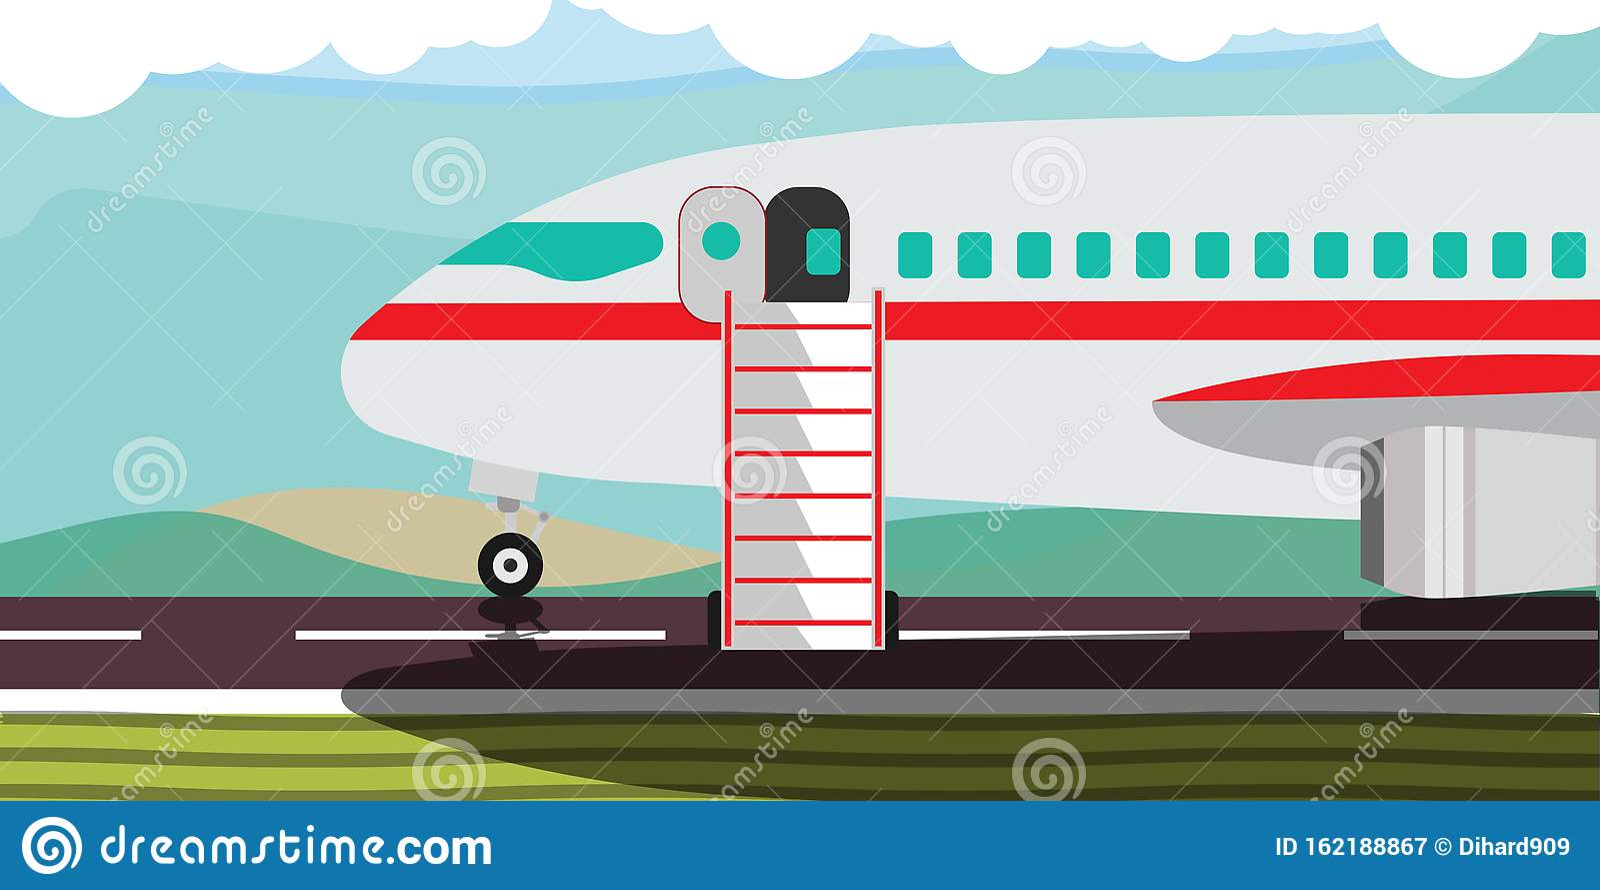 Hot Offer Deal Banner Travel Vector Illustration